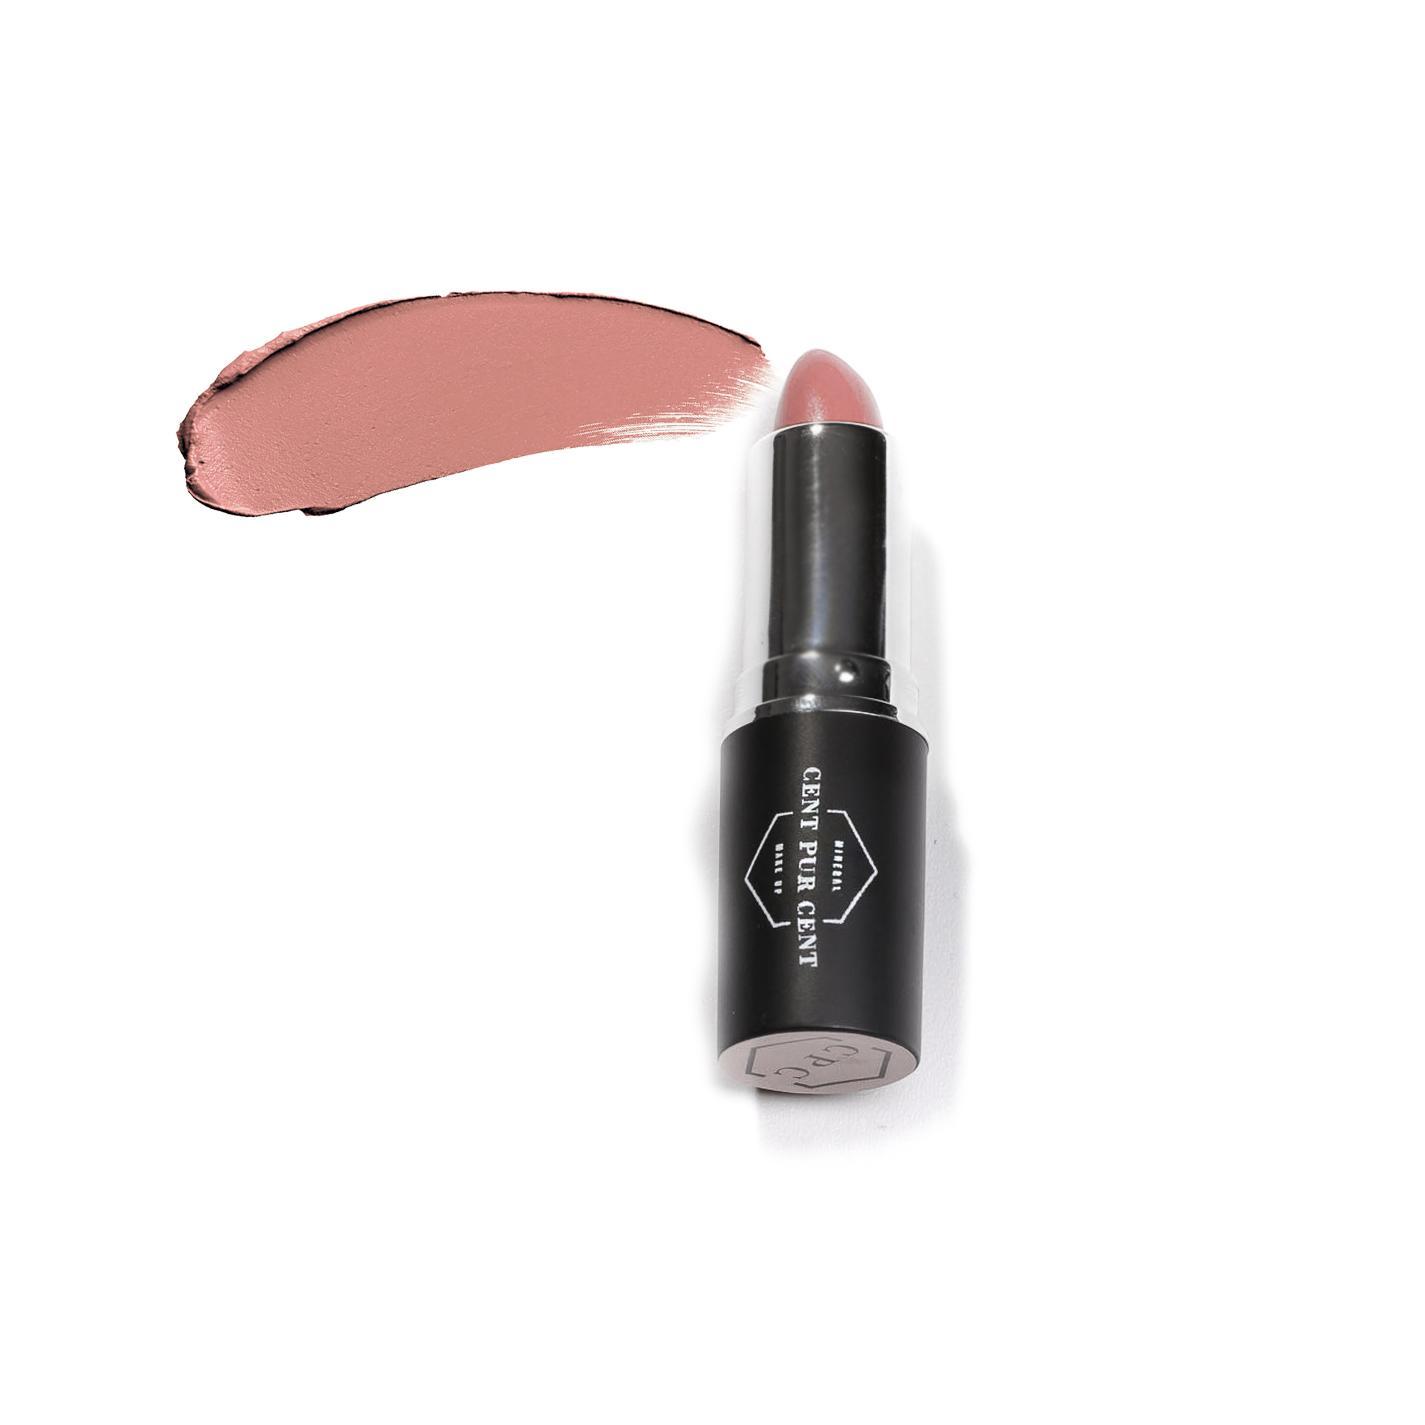 Cent Pur Cent Mineral Lipstick Saumon